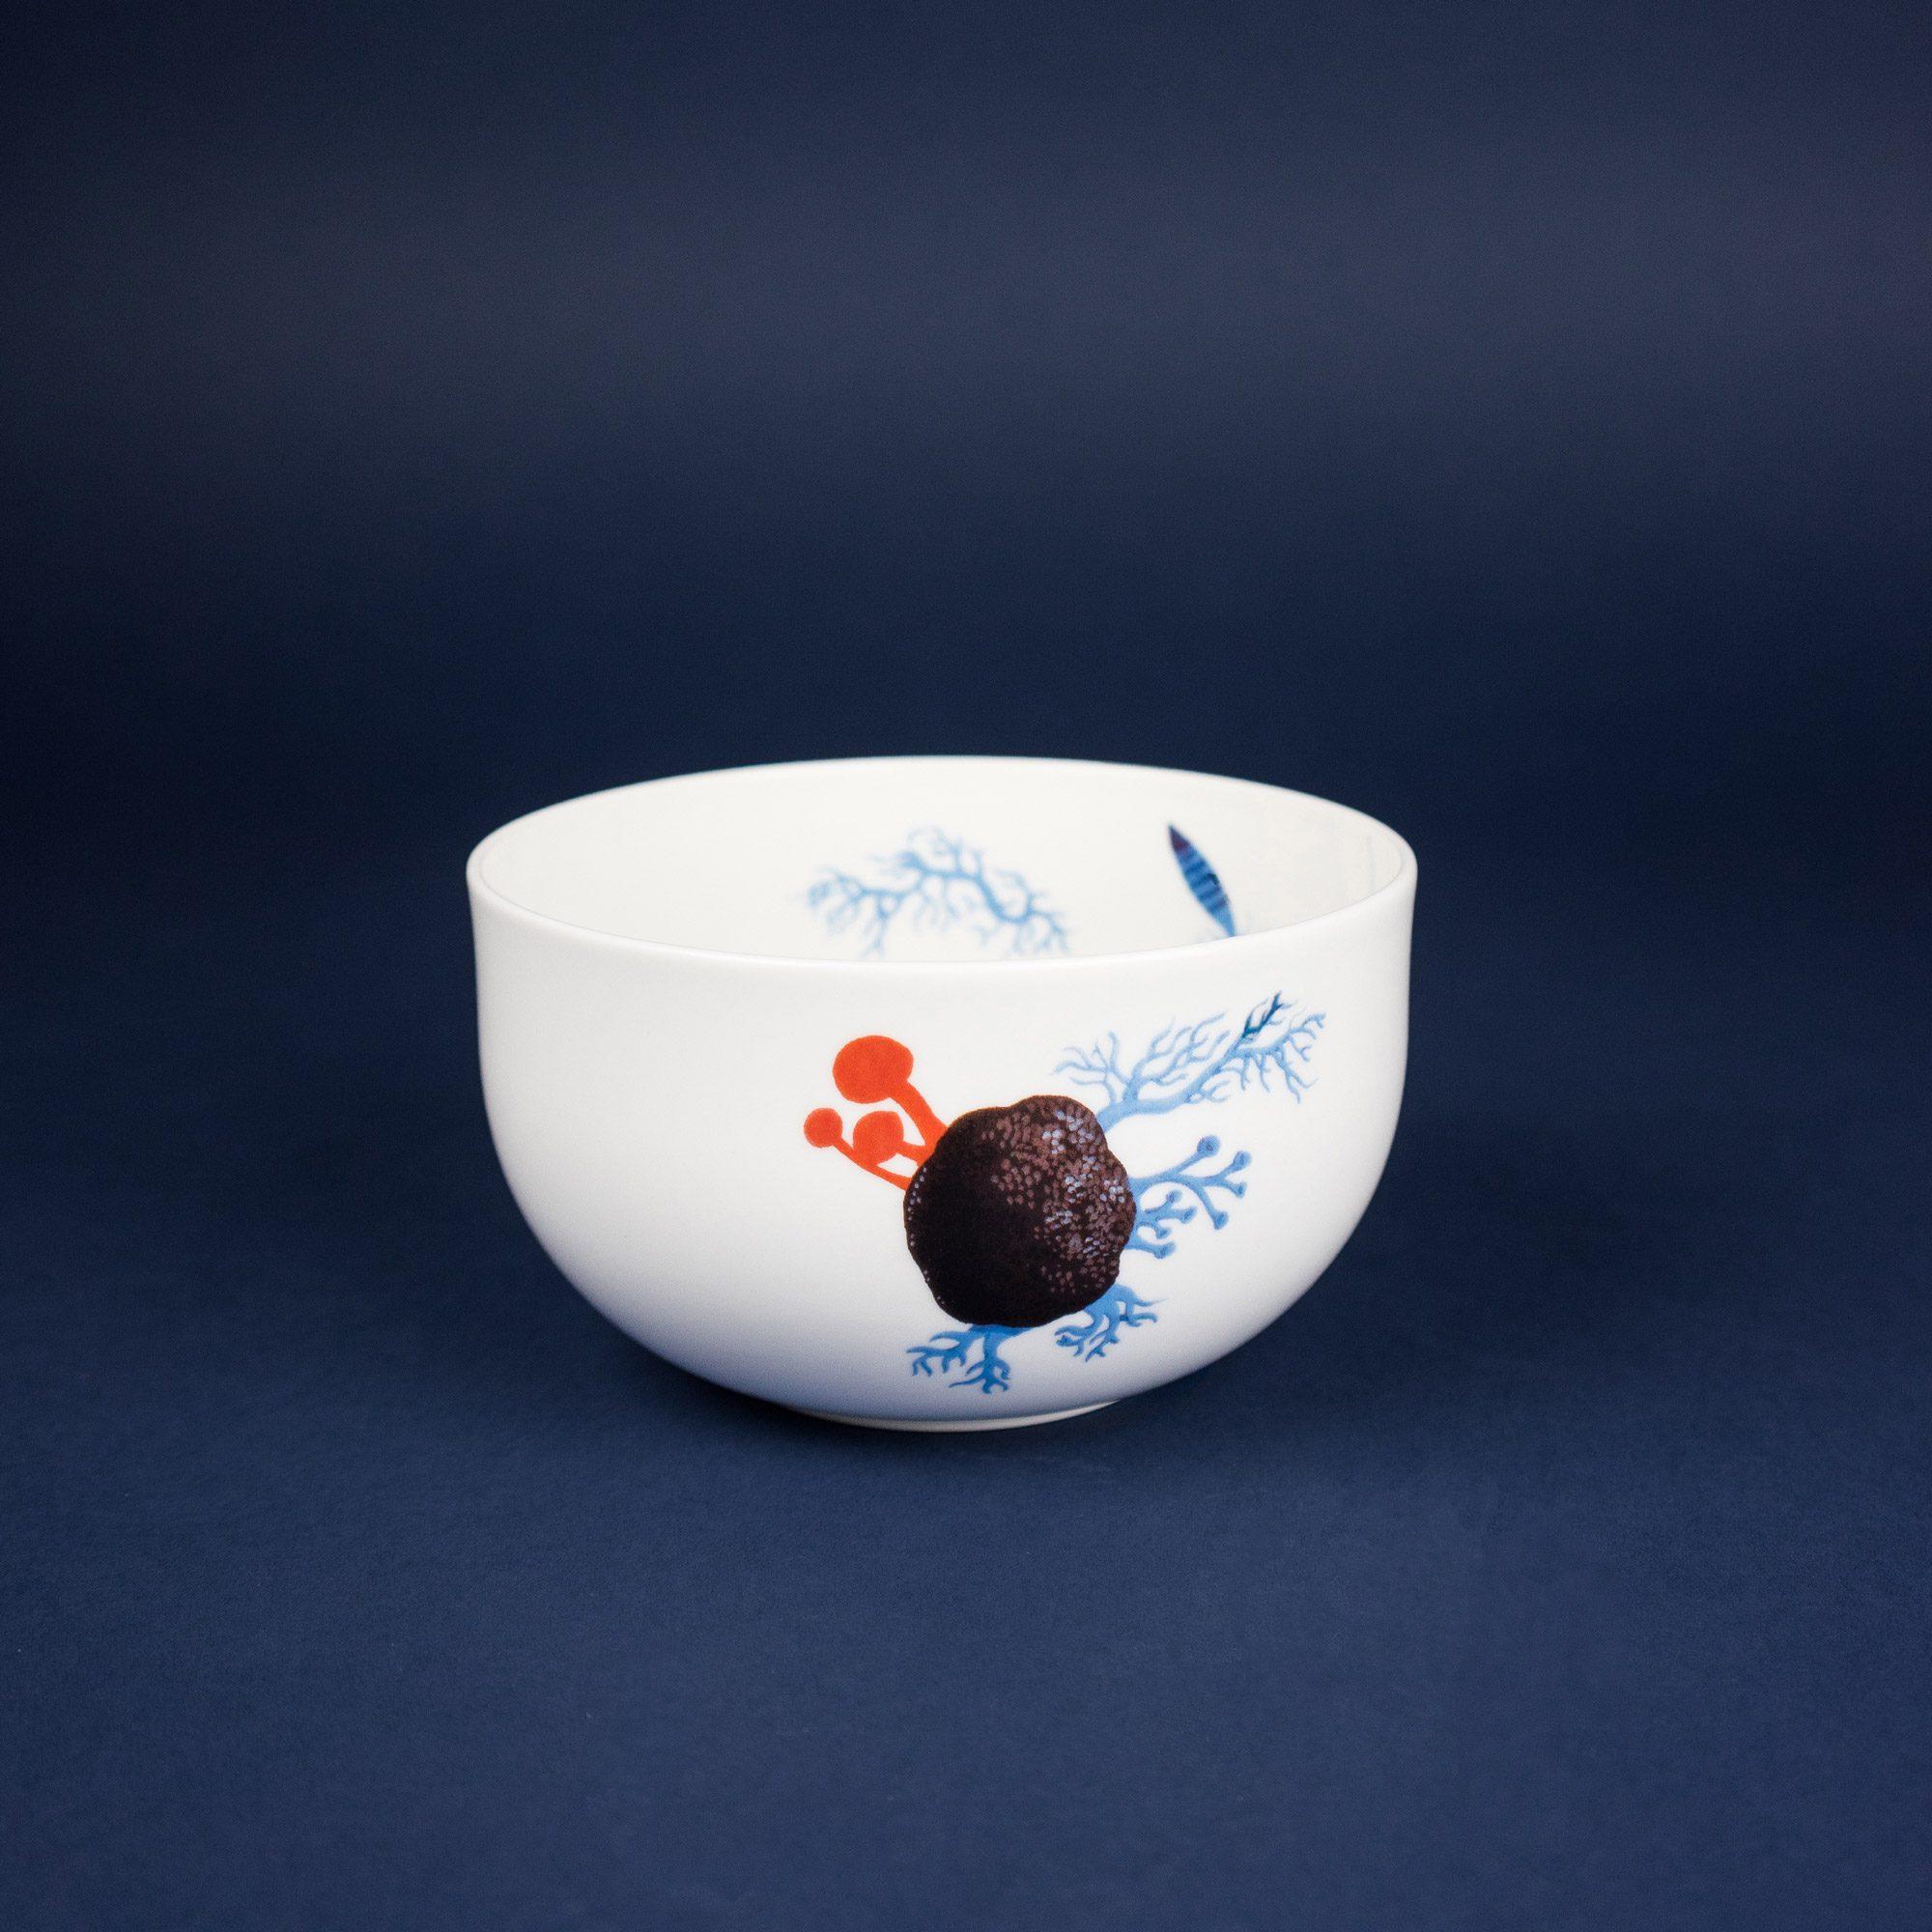 Porcelain bowl with flower illustration by Krehky